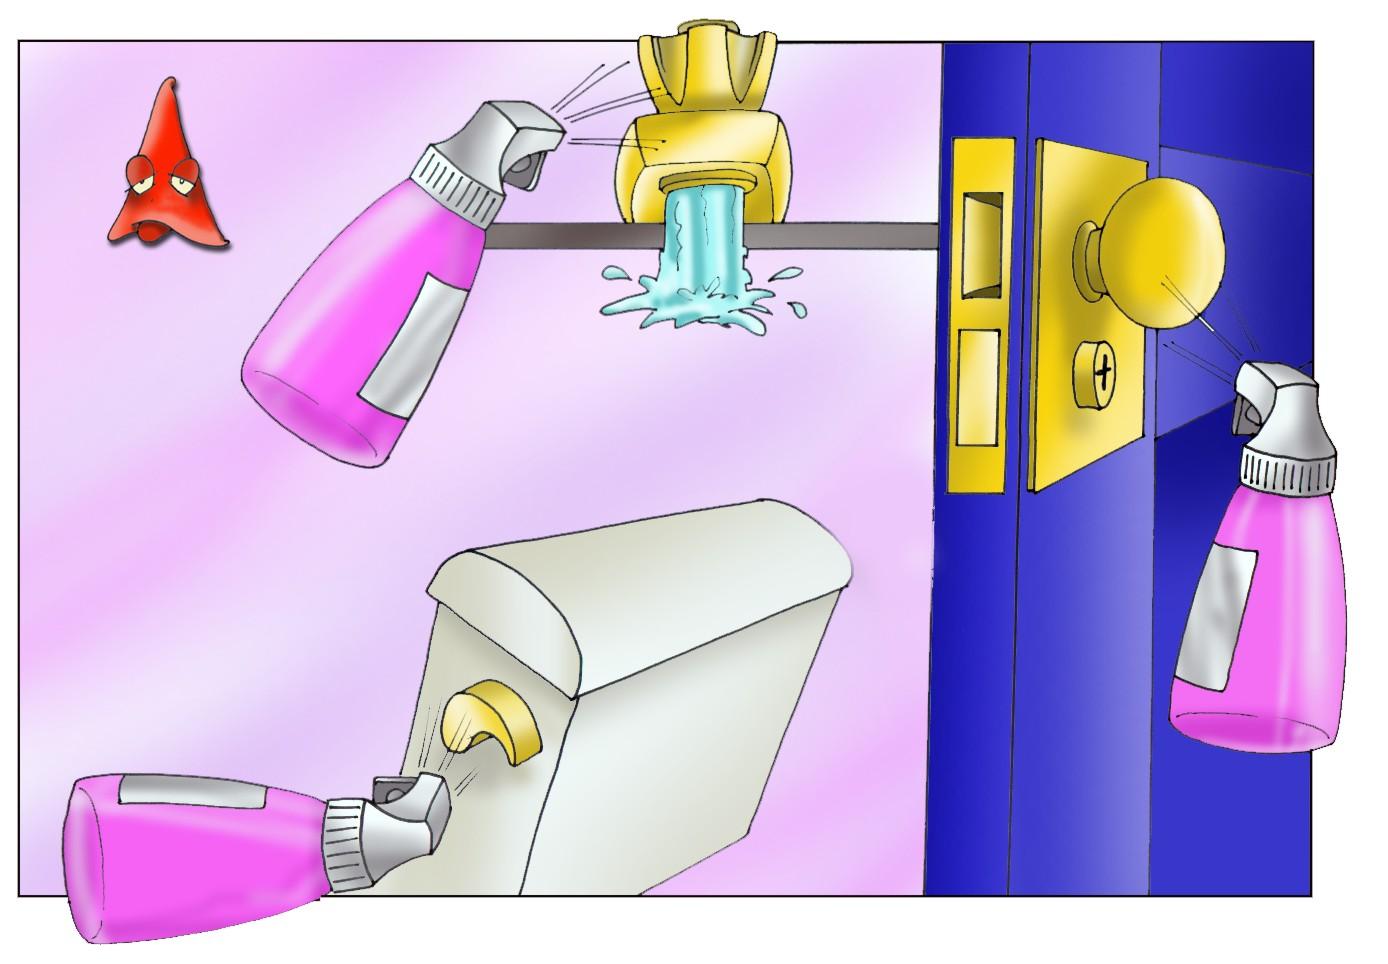 A eficácia e o tempo dos produtos de limpeza profissional